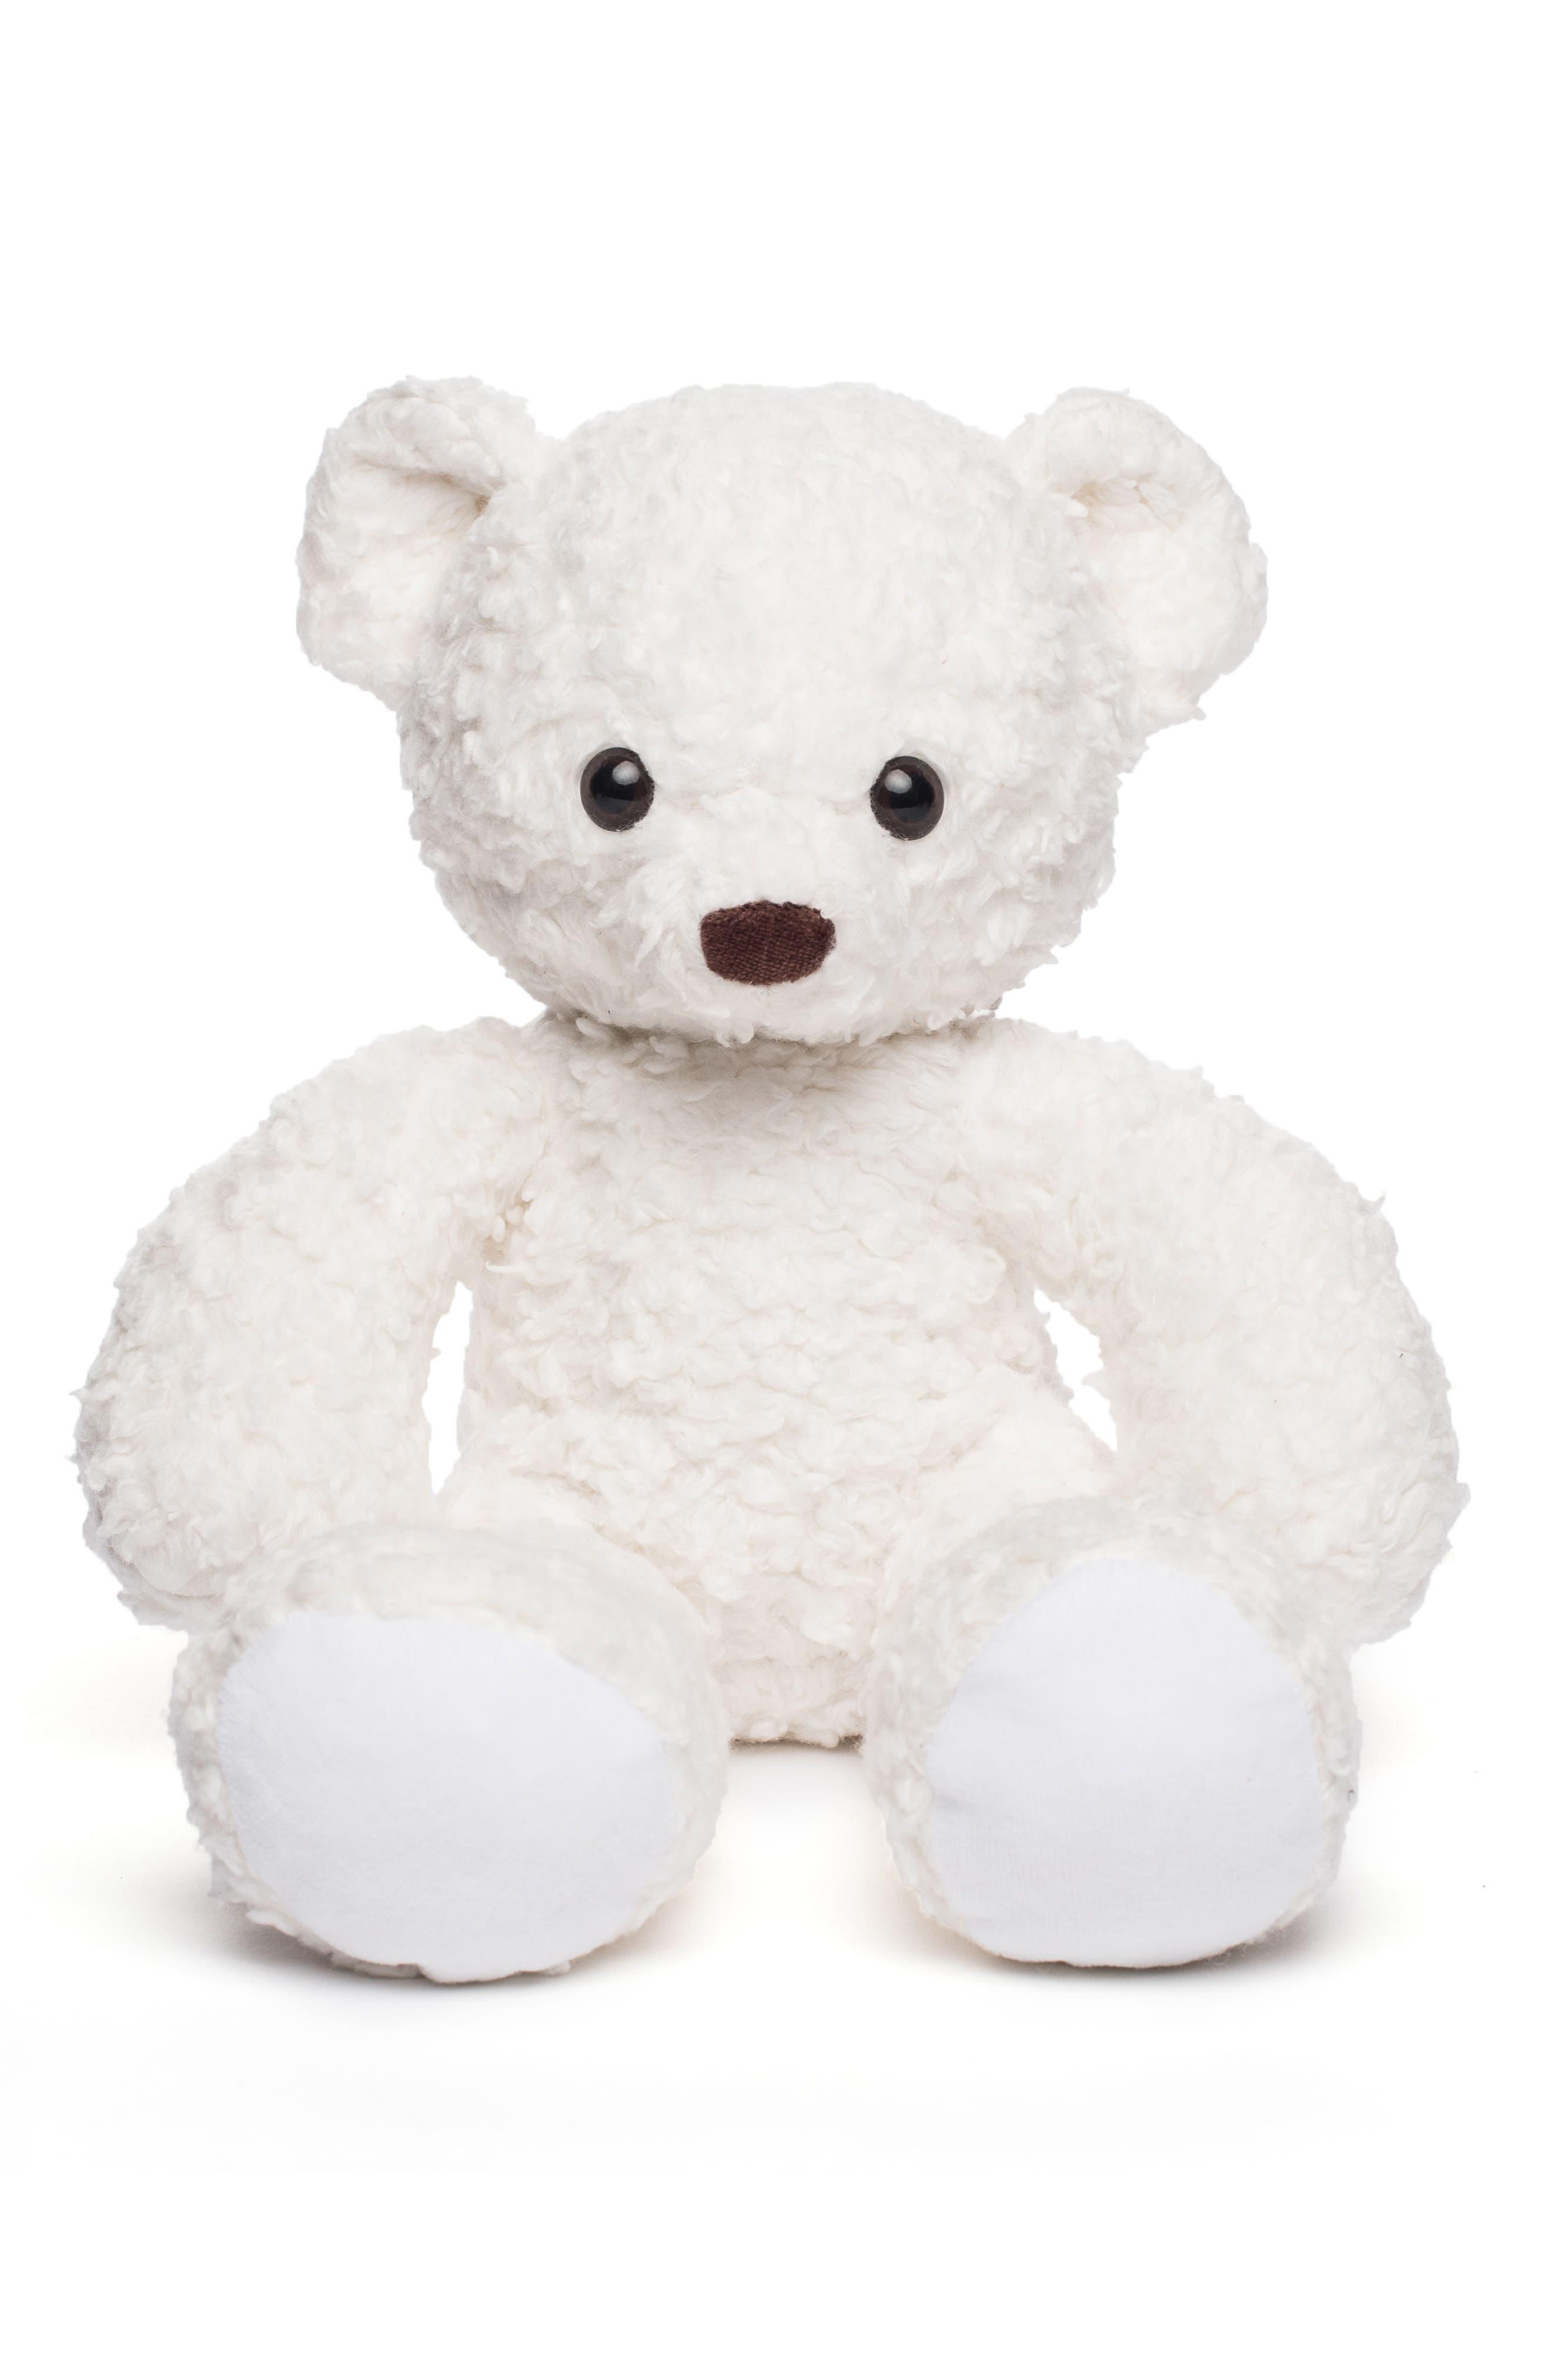 Alternate Image 1 Selected - Bears for Humanity Medium Stuffed Bear